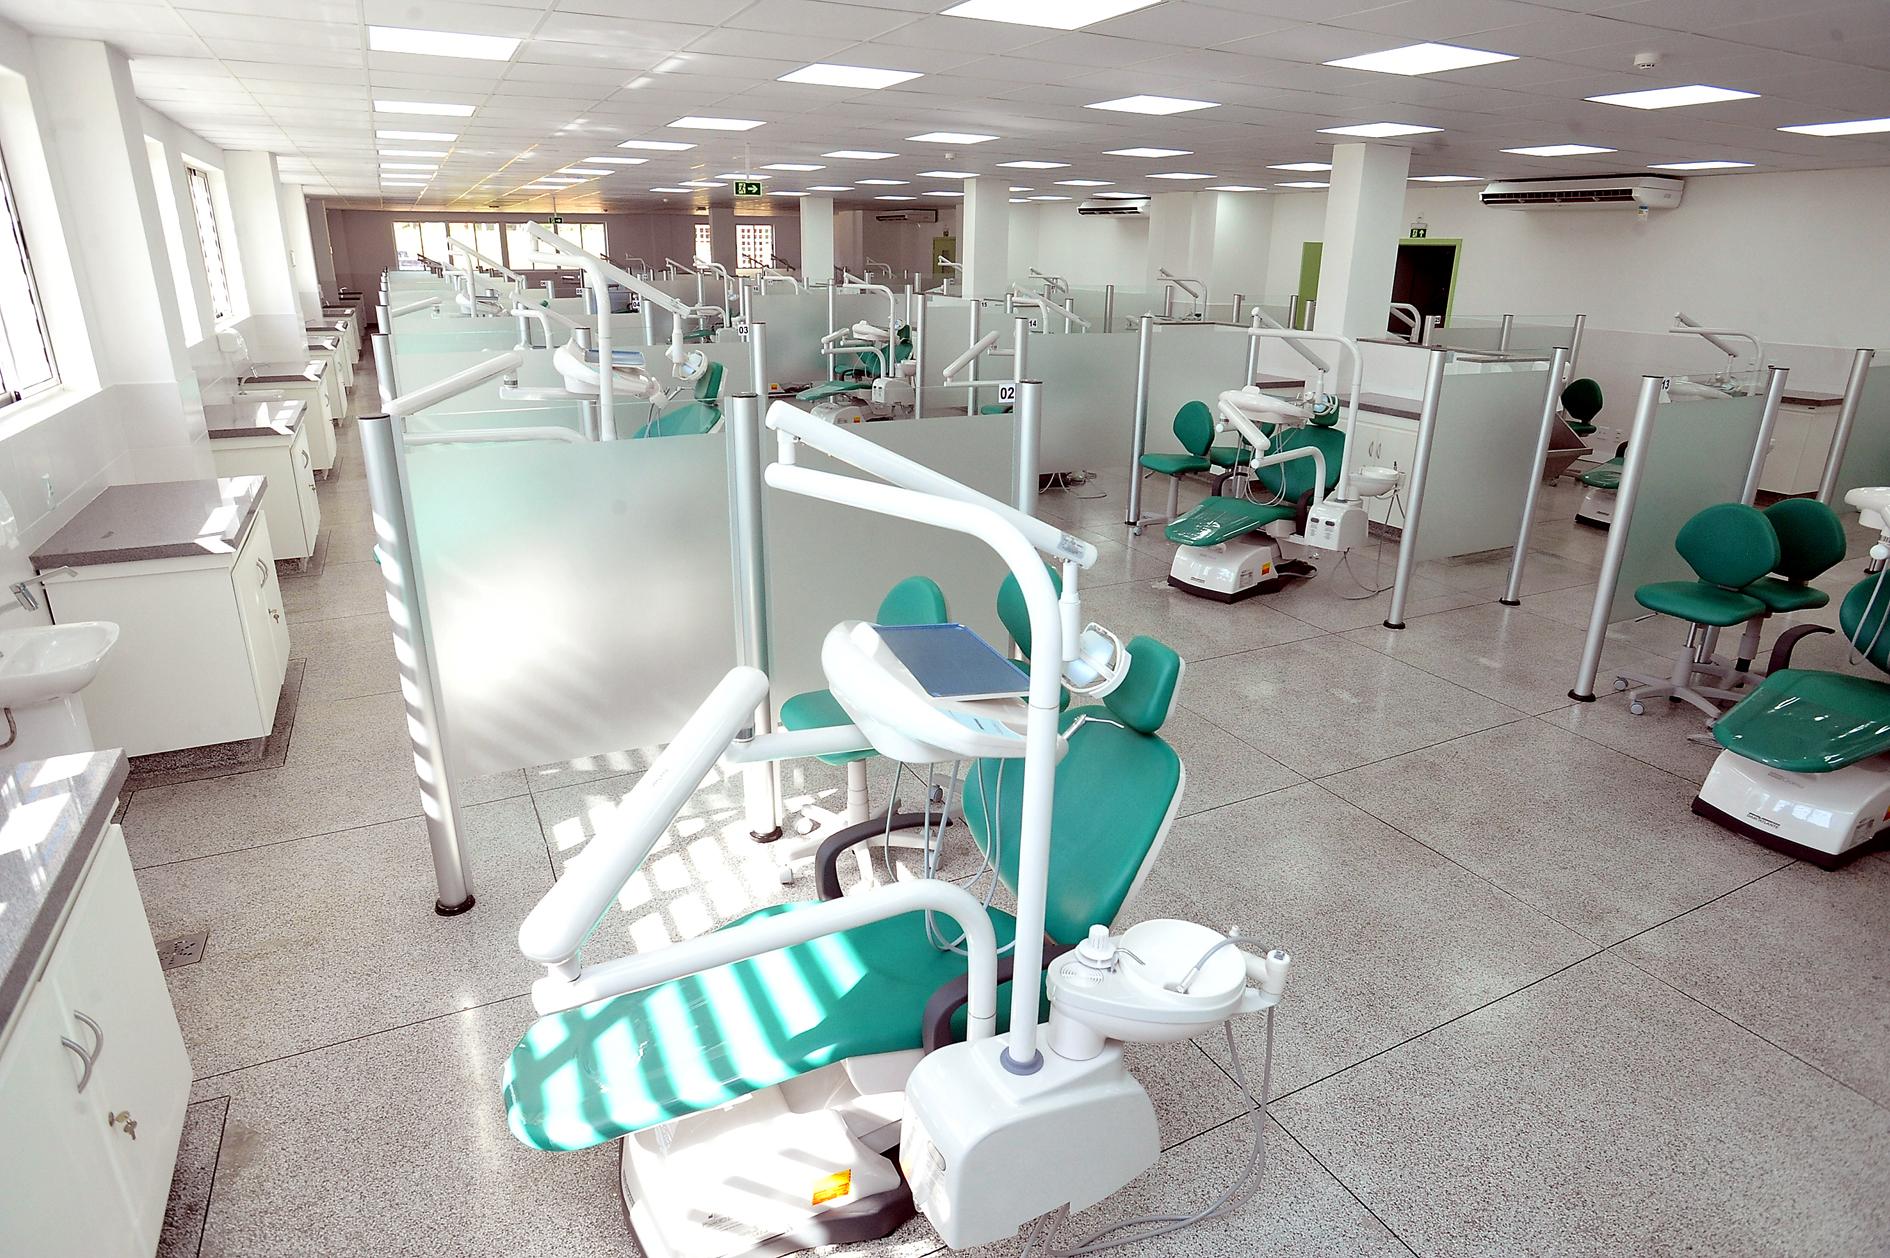 clinica odontologica universitaria UEL Foto Divulgacaob